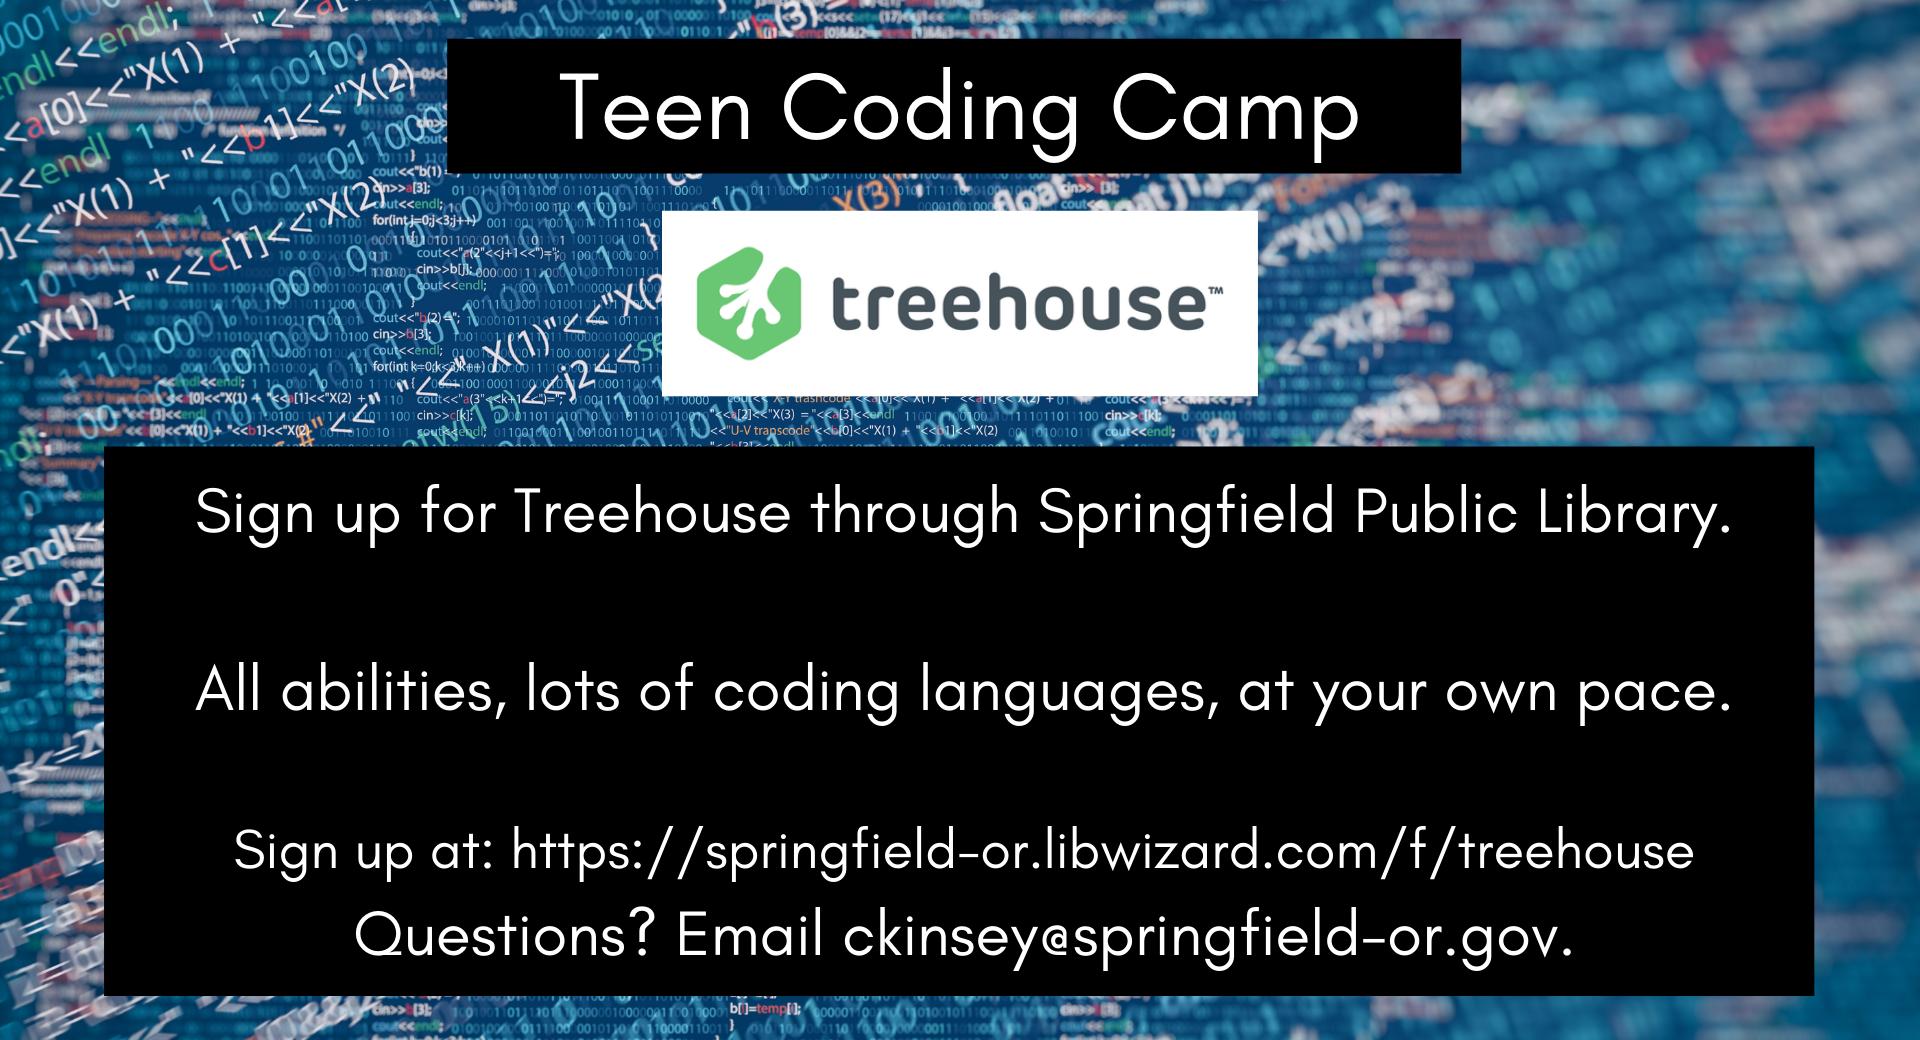 Teen Coding Camp